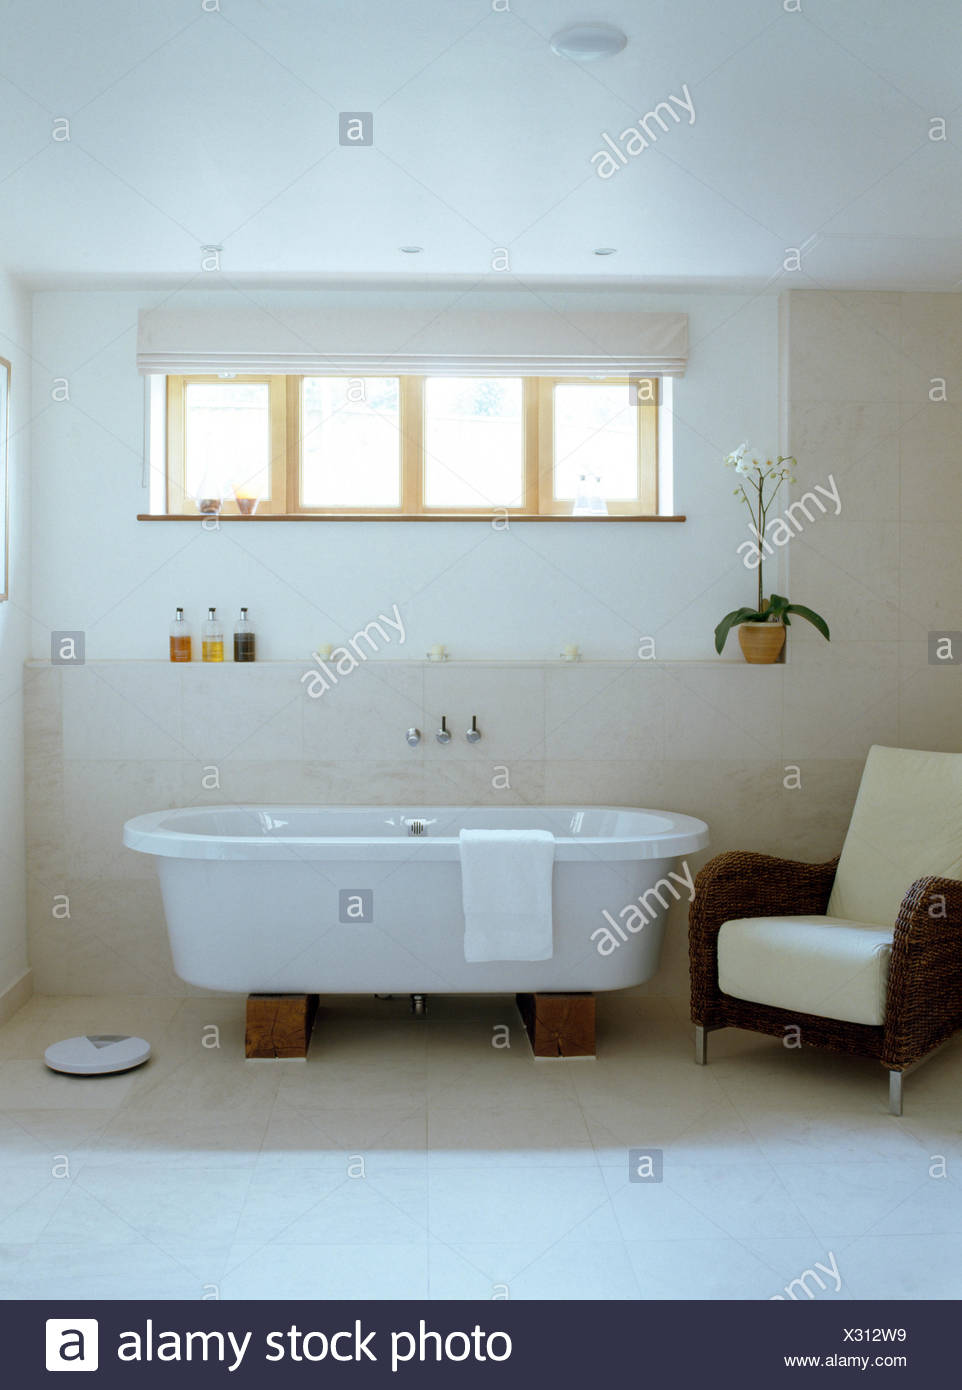 Roll Top Bath Stock Photos & Roll Top Bath Stock Images - Alamy